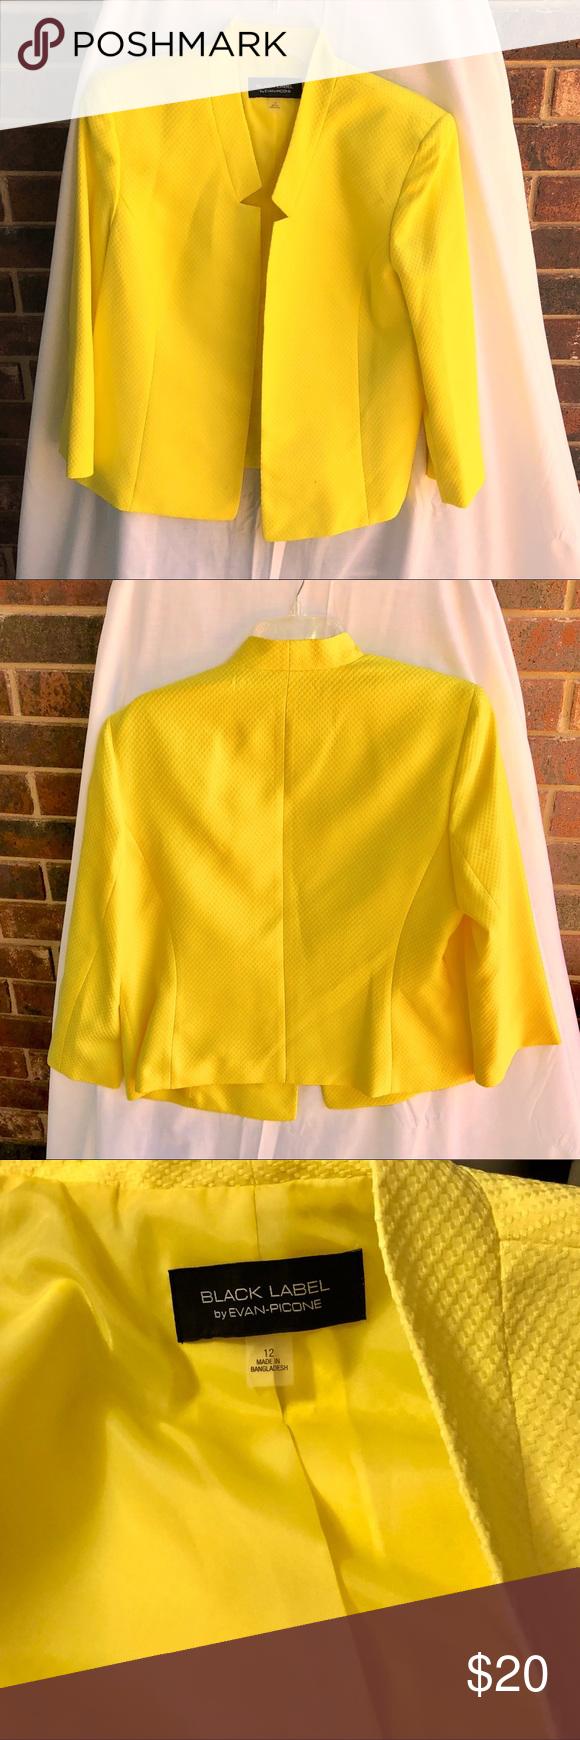 a01f878691 Evan Picone Black Label Lemon Yellow Blazer Wm 12 This is a Sunny Lemon  Yellow Jacket